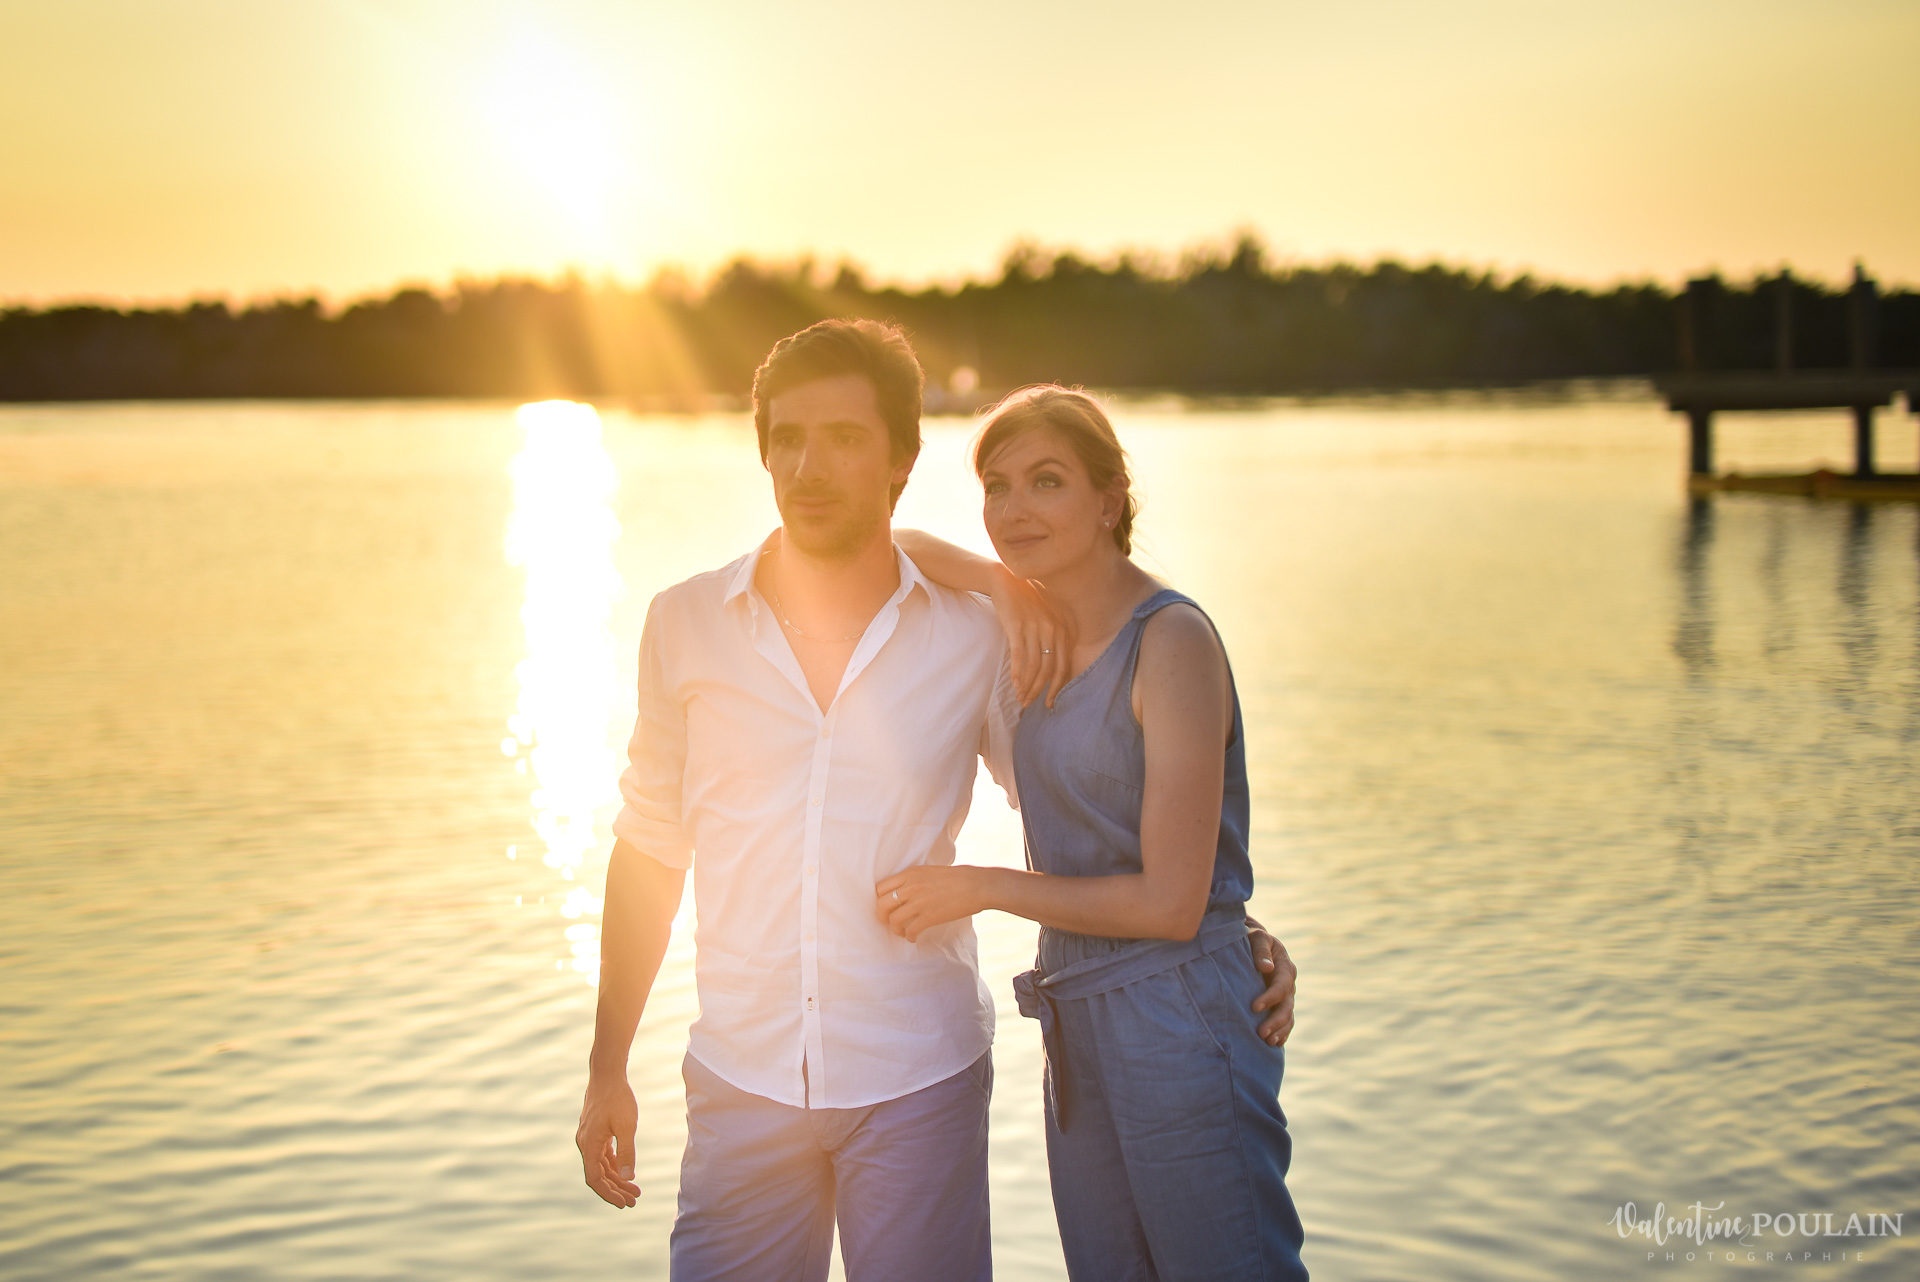 Couple Miami Wynwood - Valentine Poulain soleil